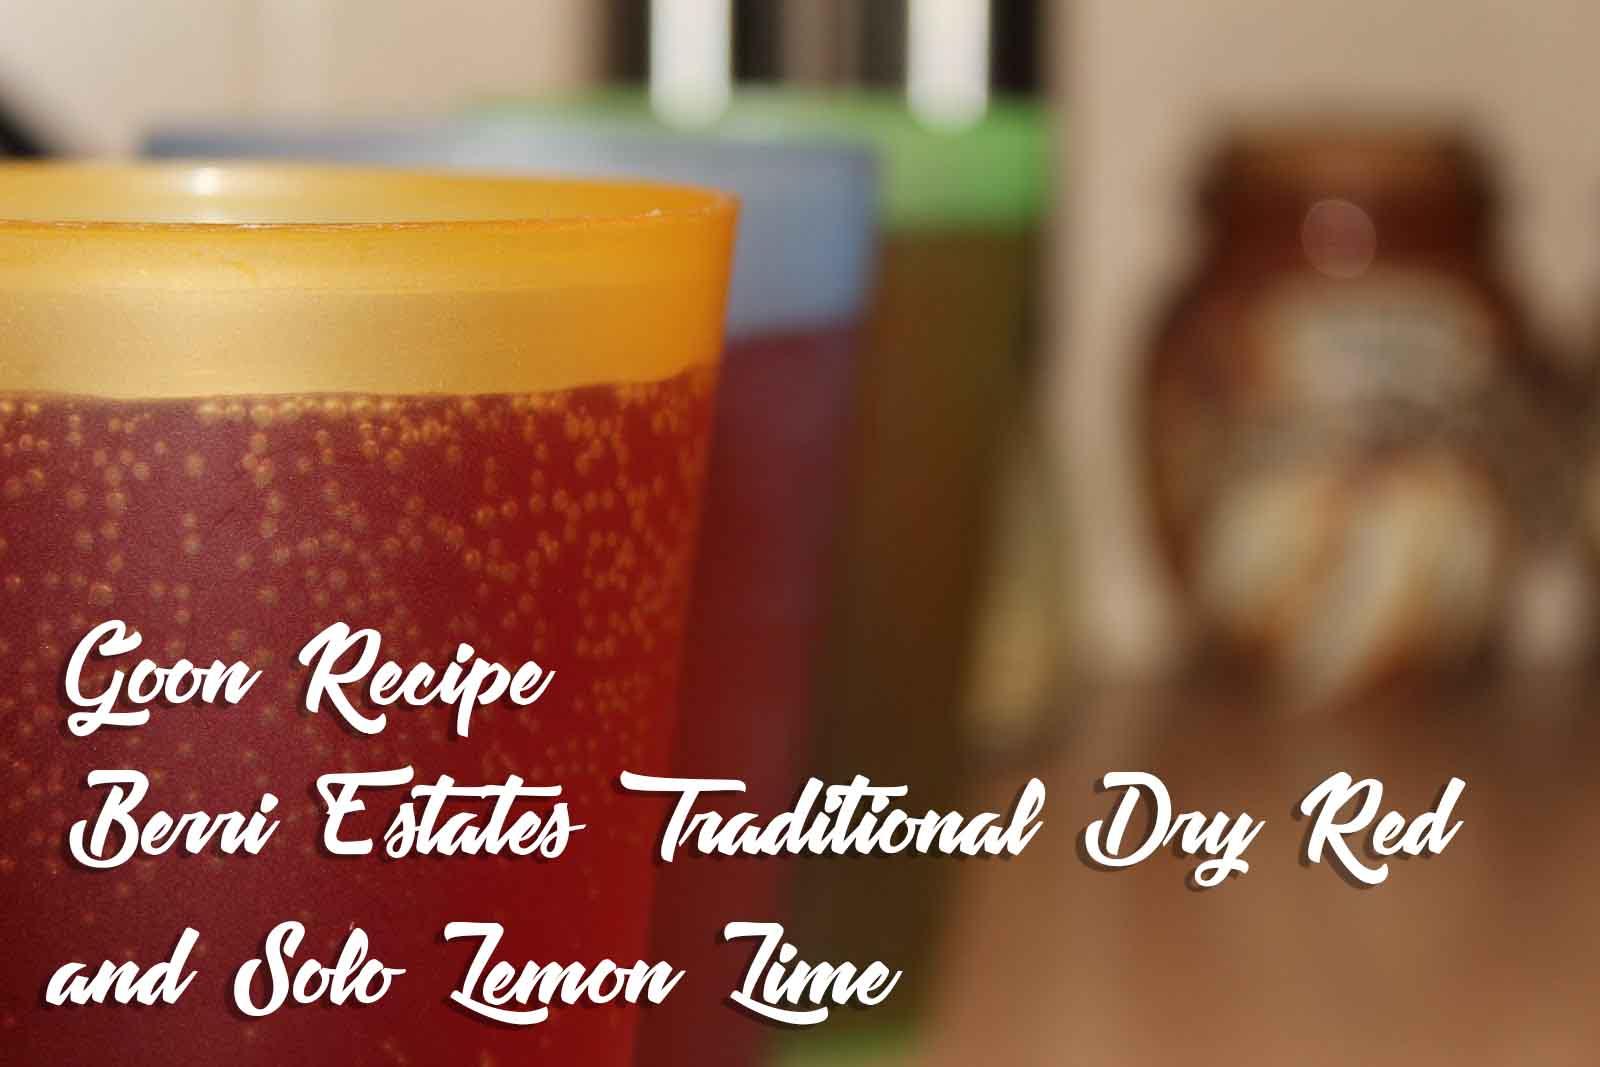 Berri_Estates_Traditional_Dry_Red_and_Solo_Lemon_Lime_Goon_Recipe